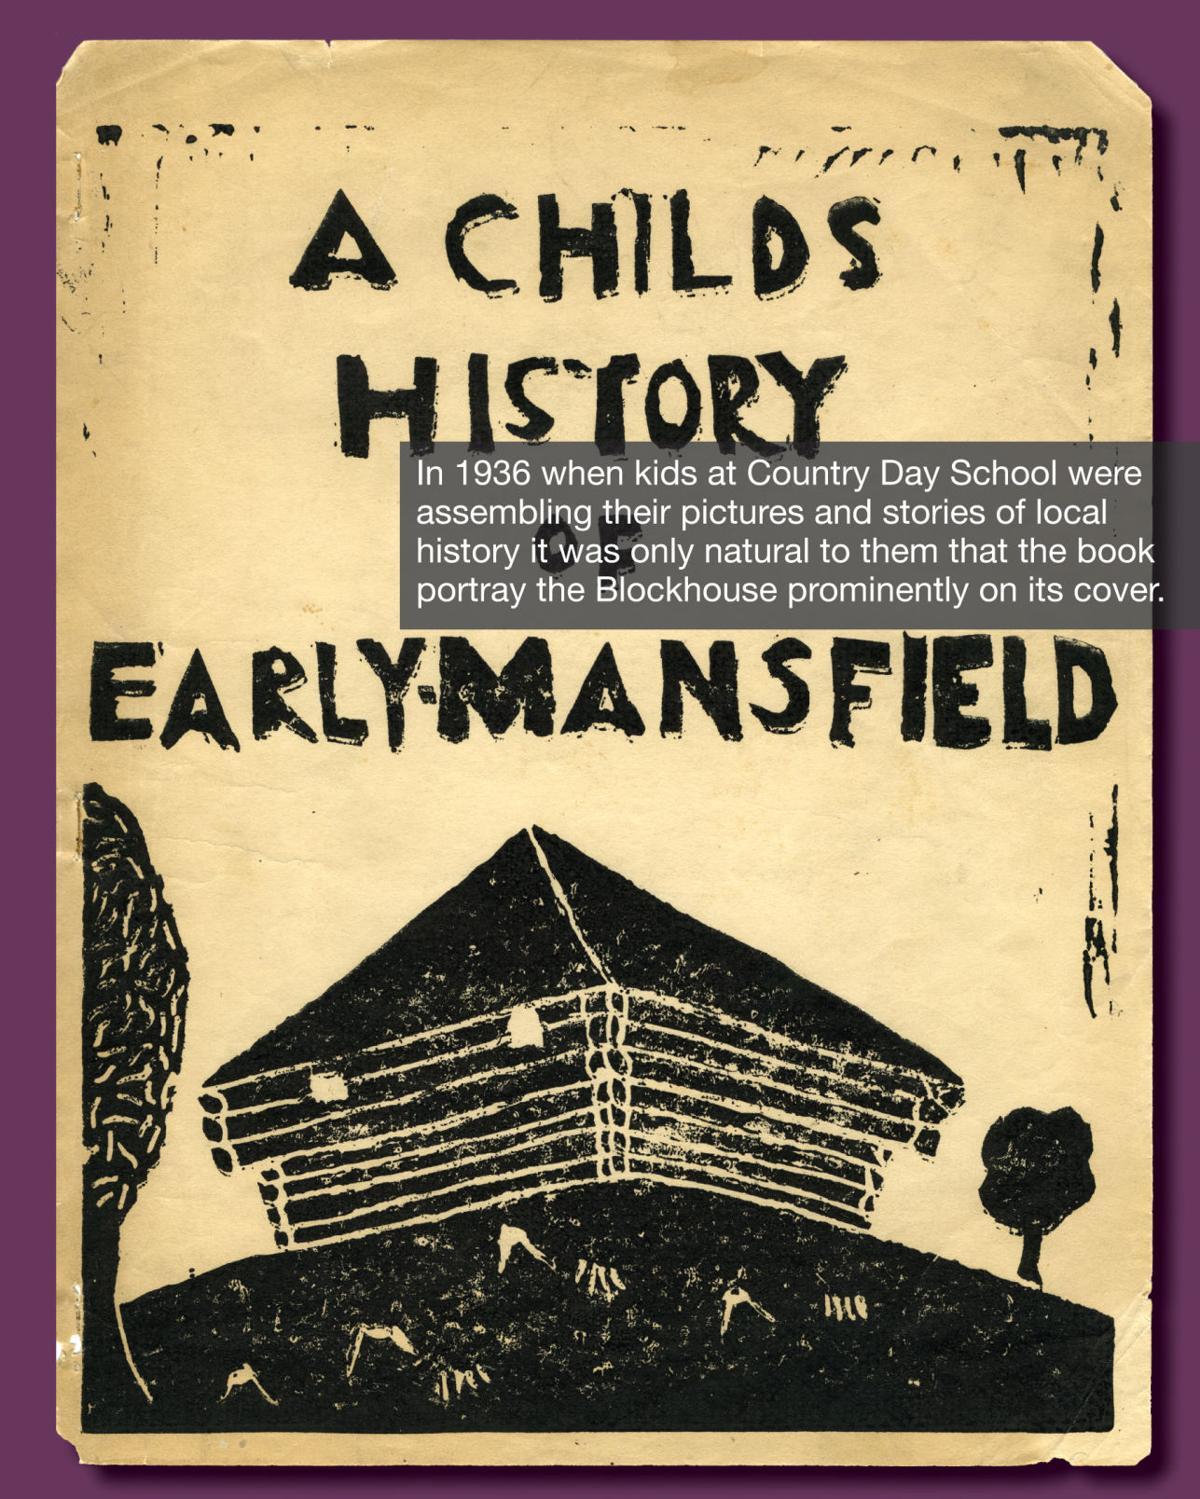 A Child's History